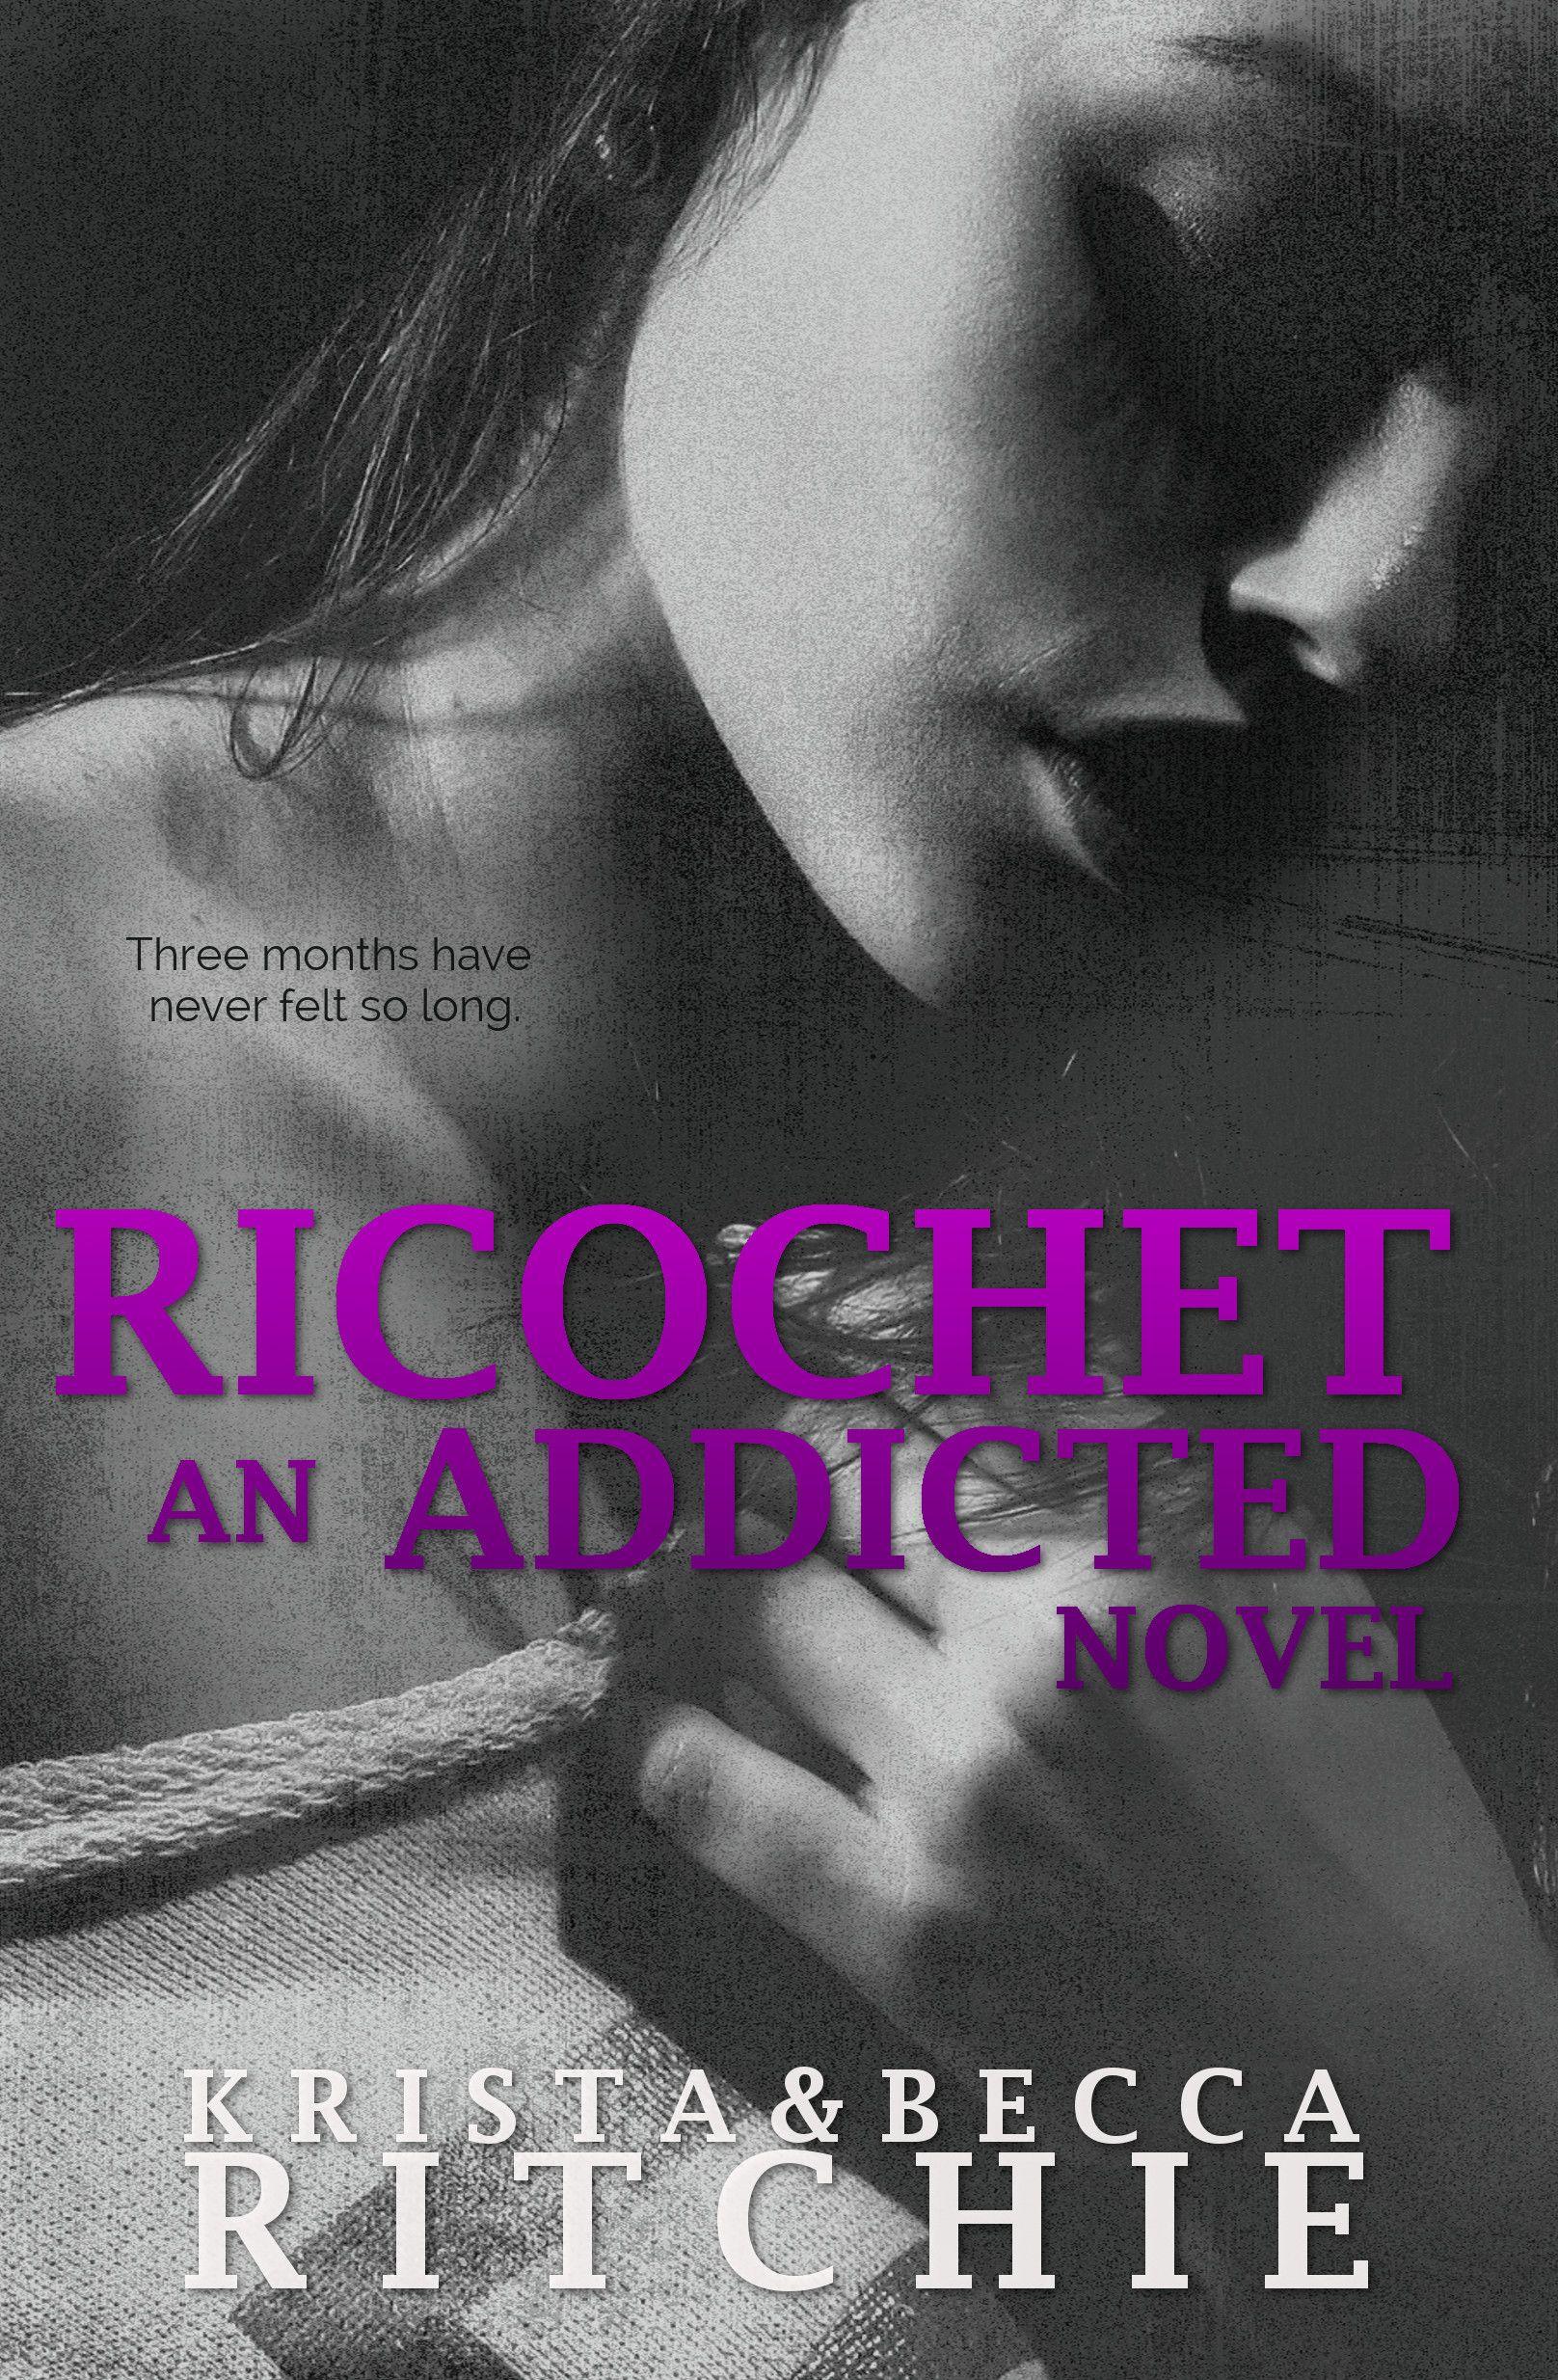 Ricochet by Krista & Becca Ritchie - 2014 edition #newadult #romance